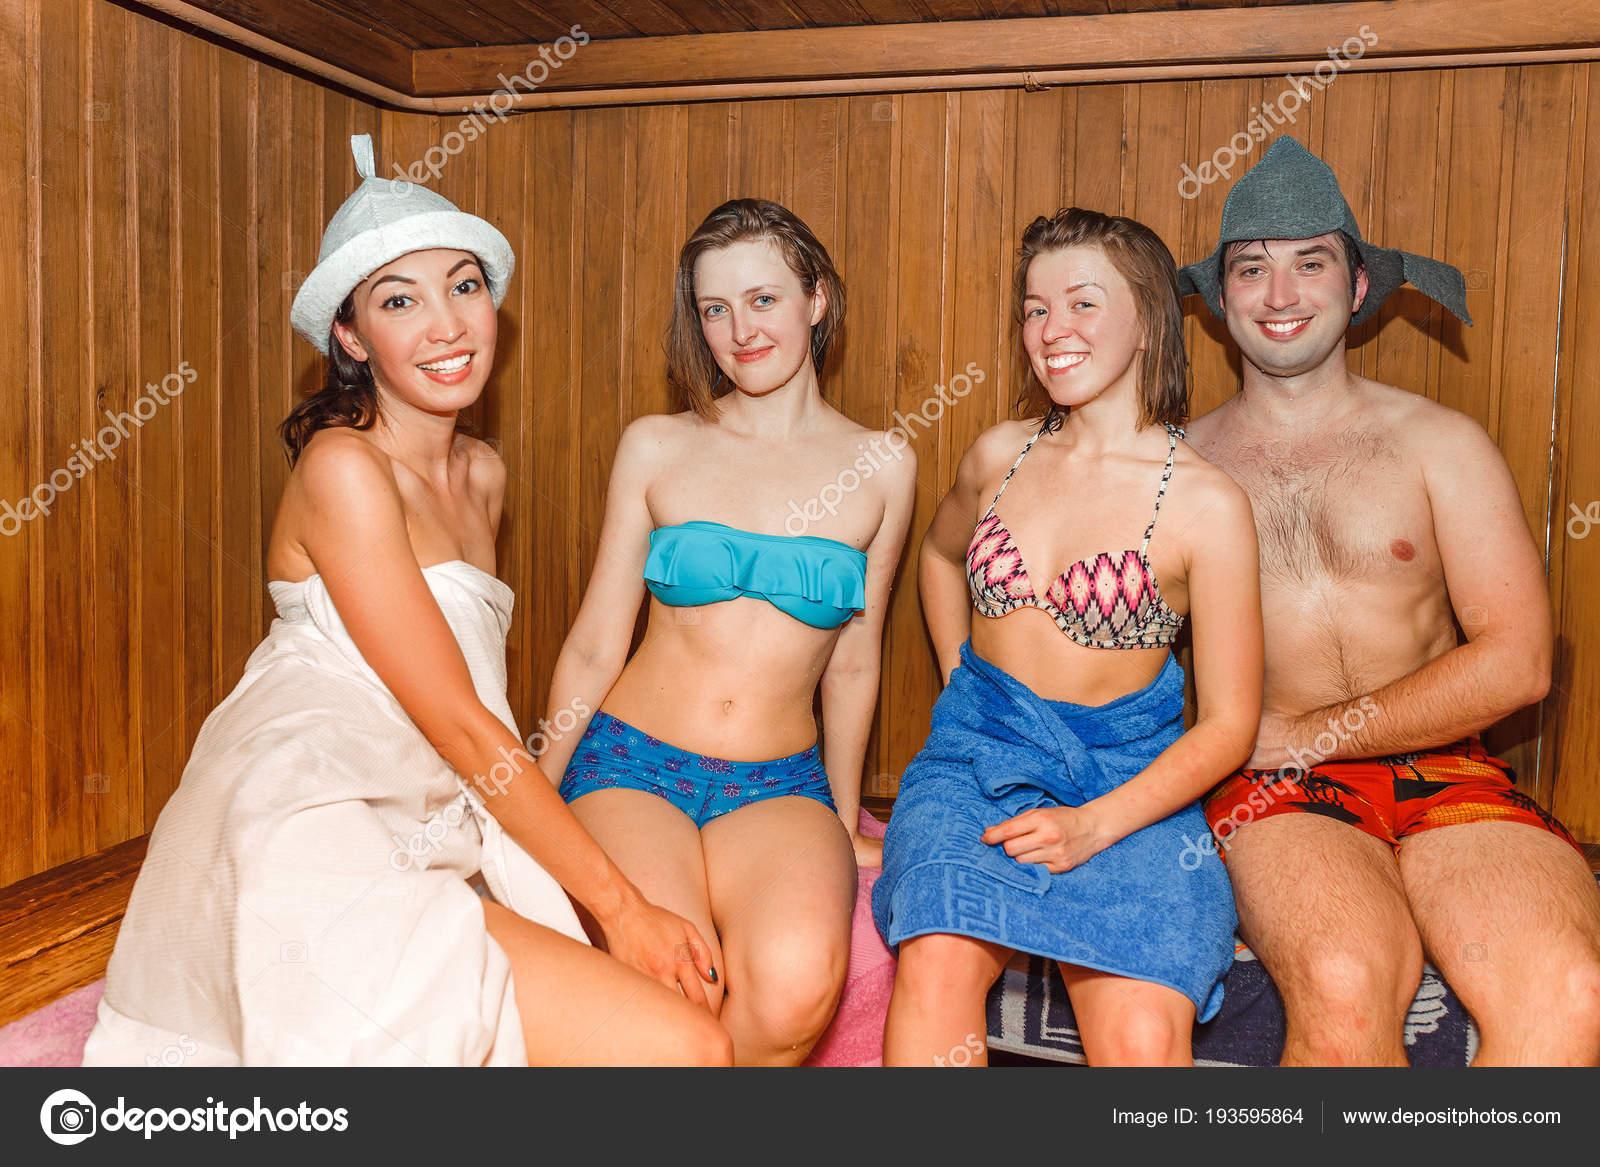 Nude chicks in walmart